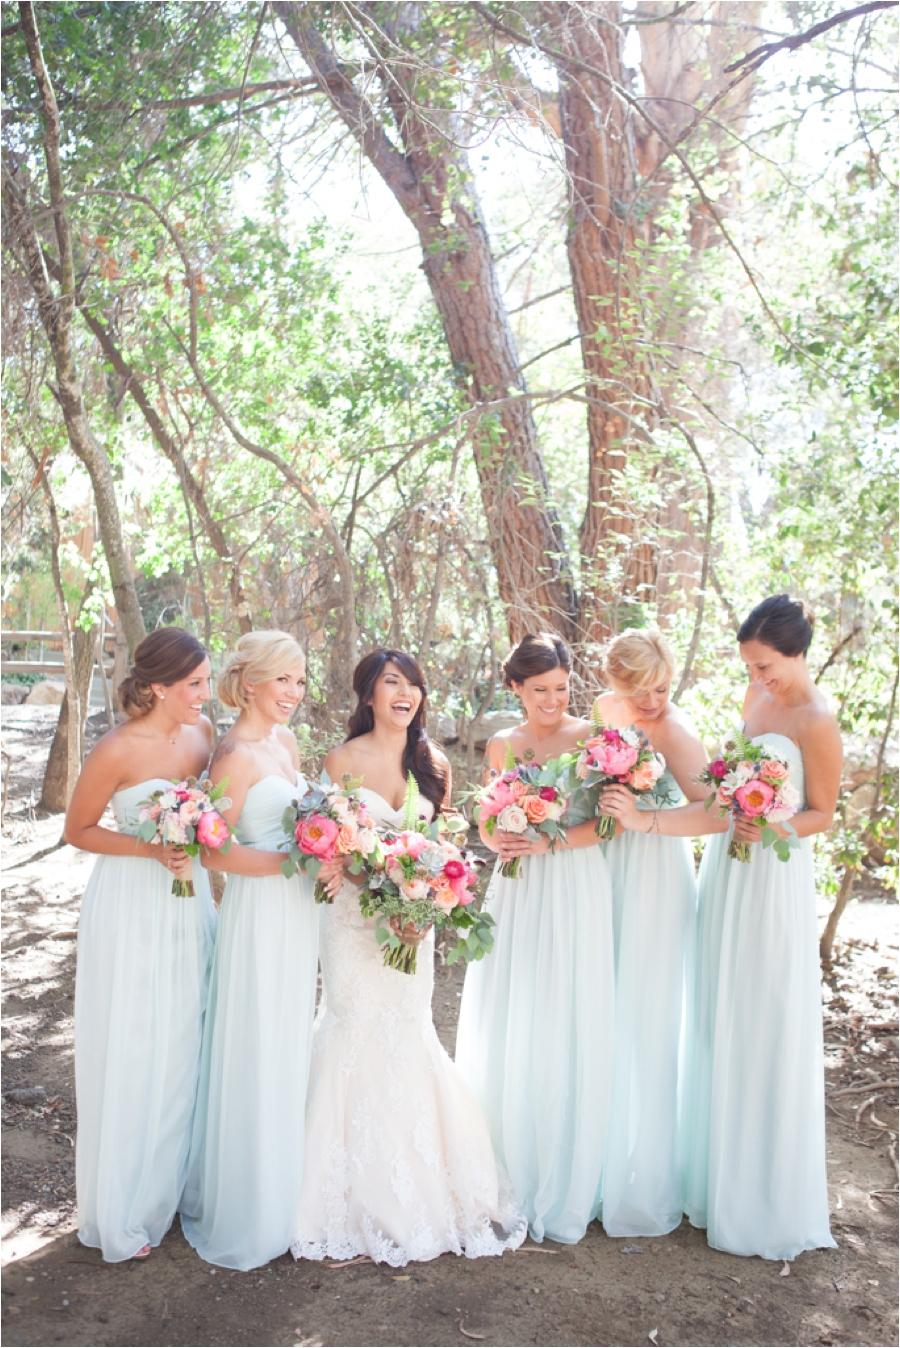 Jasmine and Donny- Calamigos Ranch Wedding ©Shaun and Skyla Walton-53.jpg